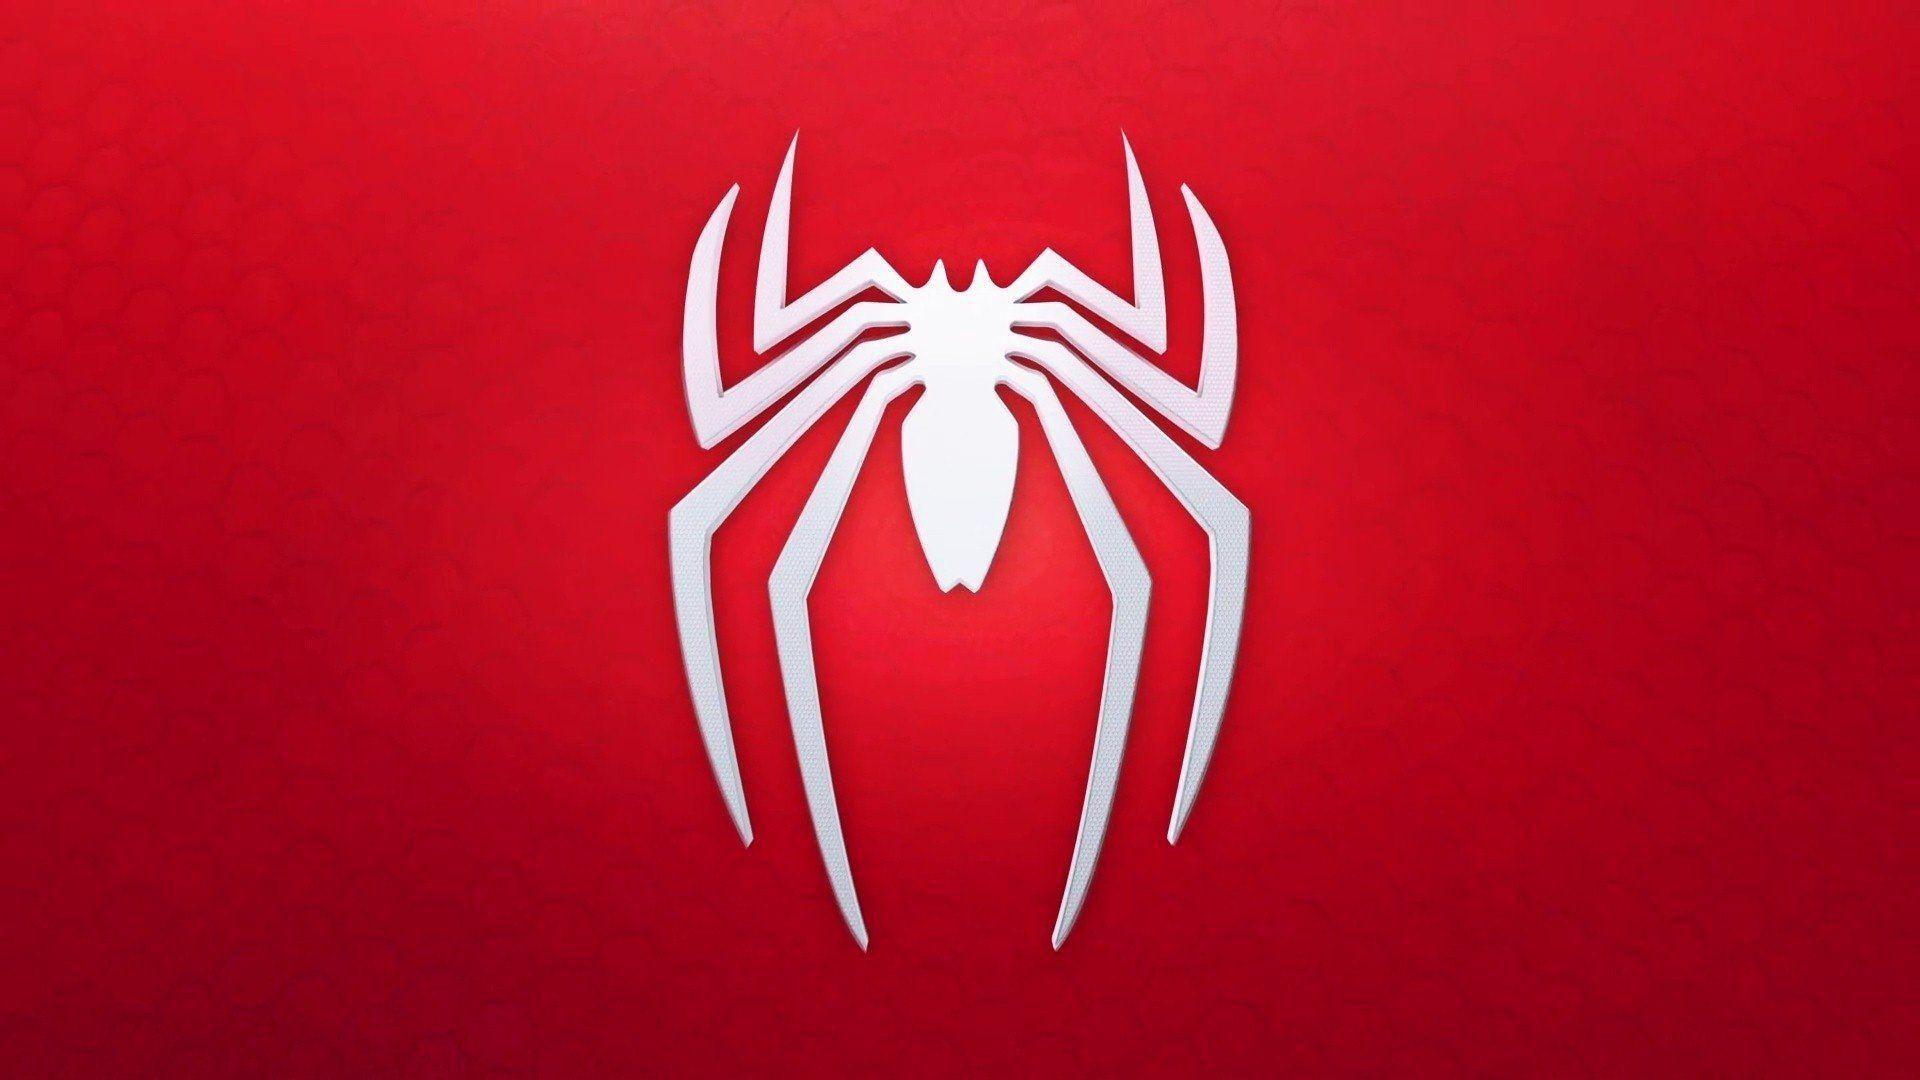 13 Games Like Spider Man For Ps4 2019 Hero Wallpaper